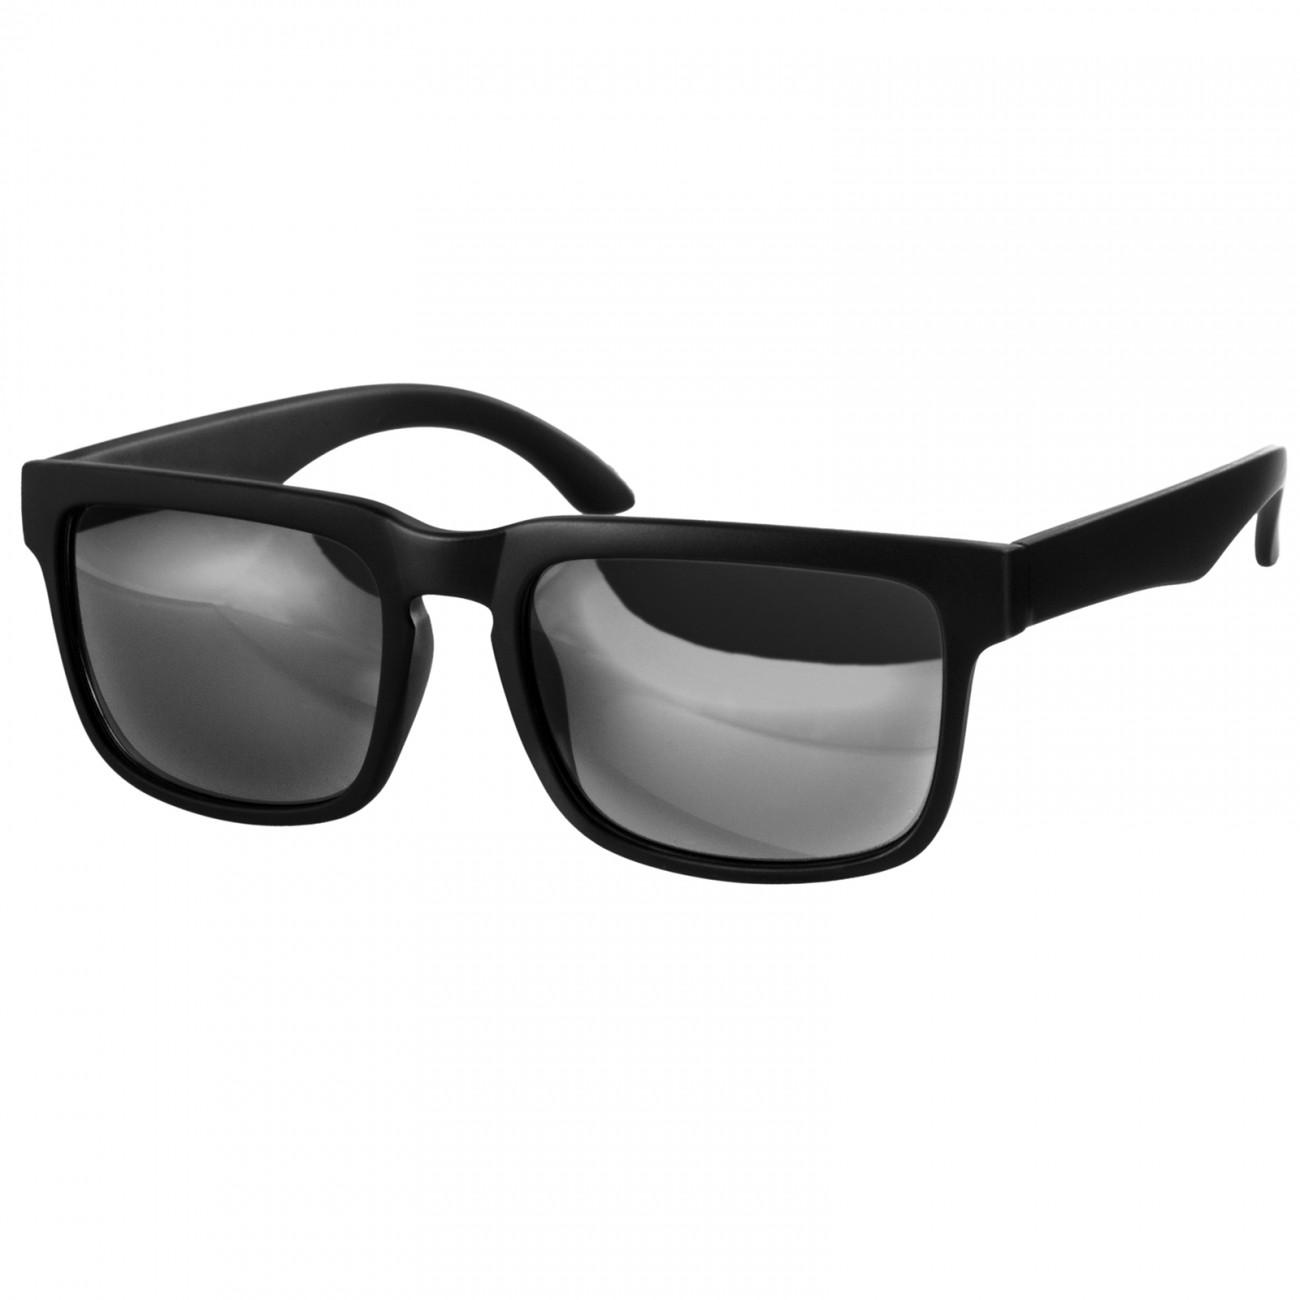 caspar unisex wayfarer brille sonnenbrille mit. Black Bedroom Furniture Sets. Home Design Ideas